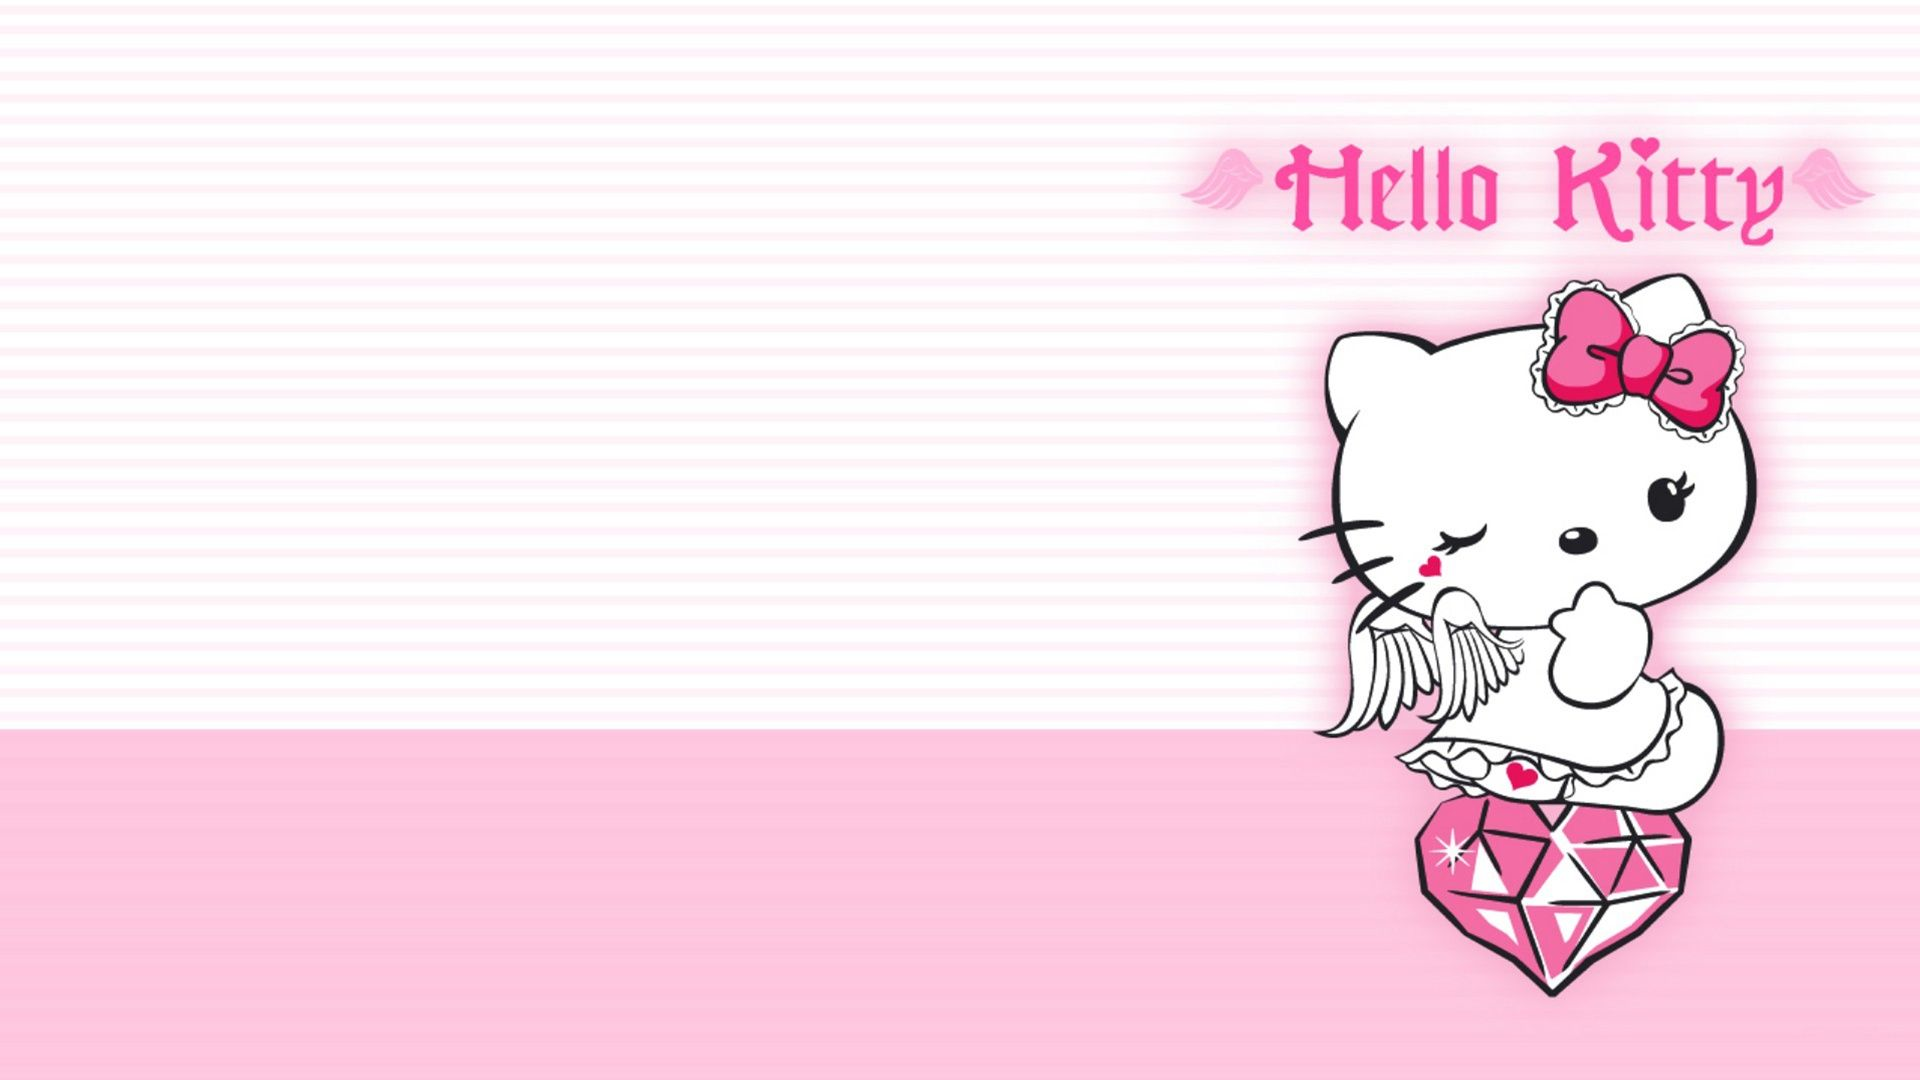 Cool Wallpaper Hello Kitty Angel - c238a0af57df7e4f4cdcf44c6ea0b1ff  2018_223488.jpg